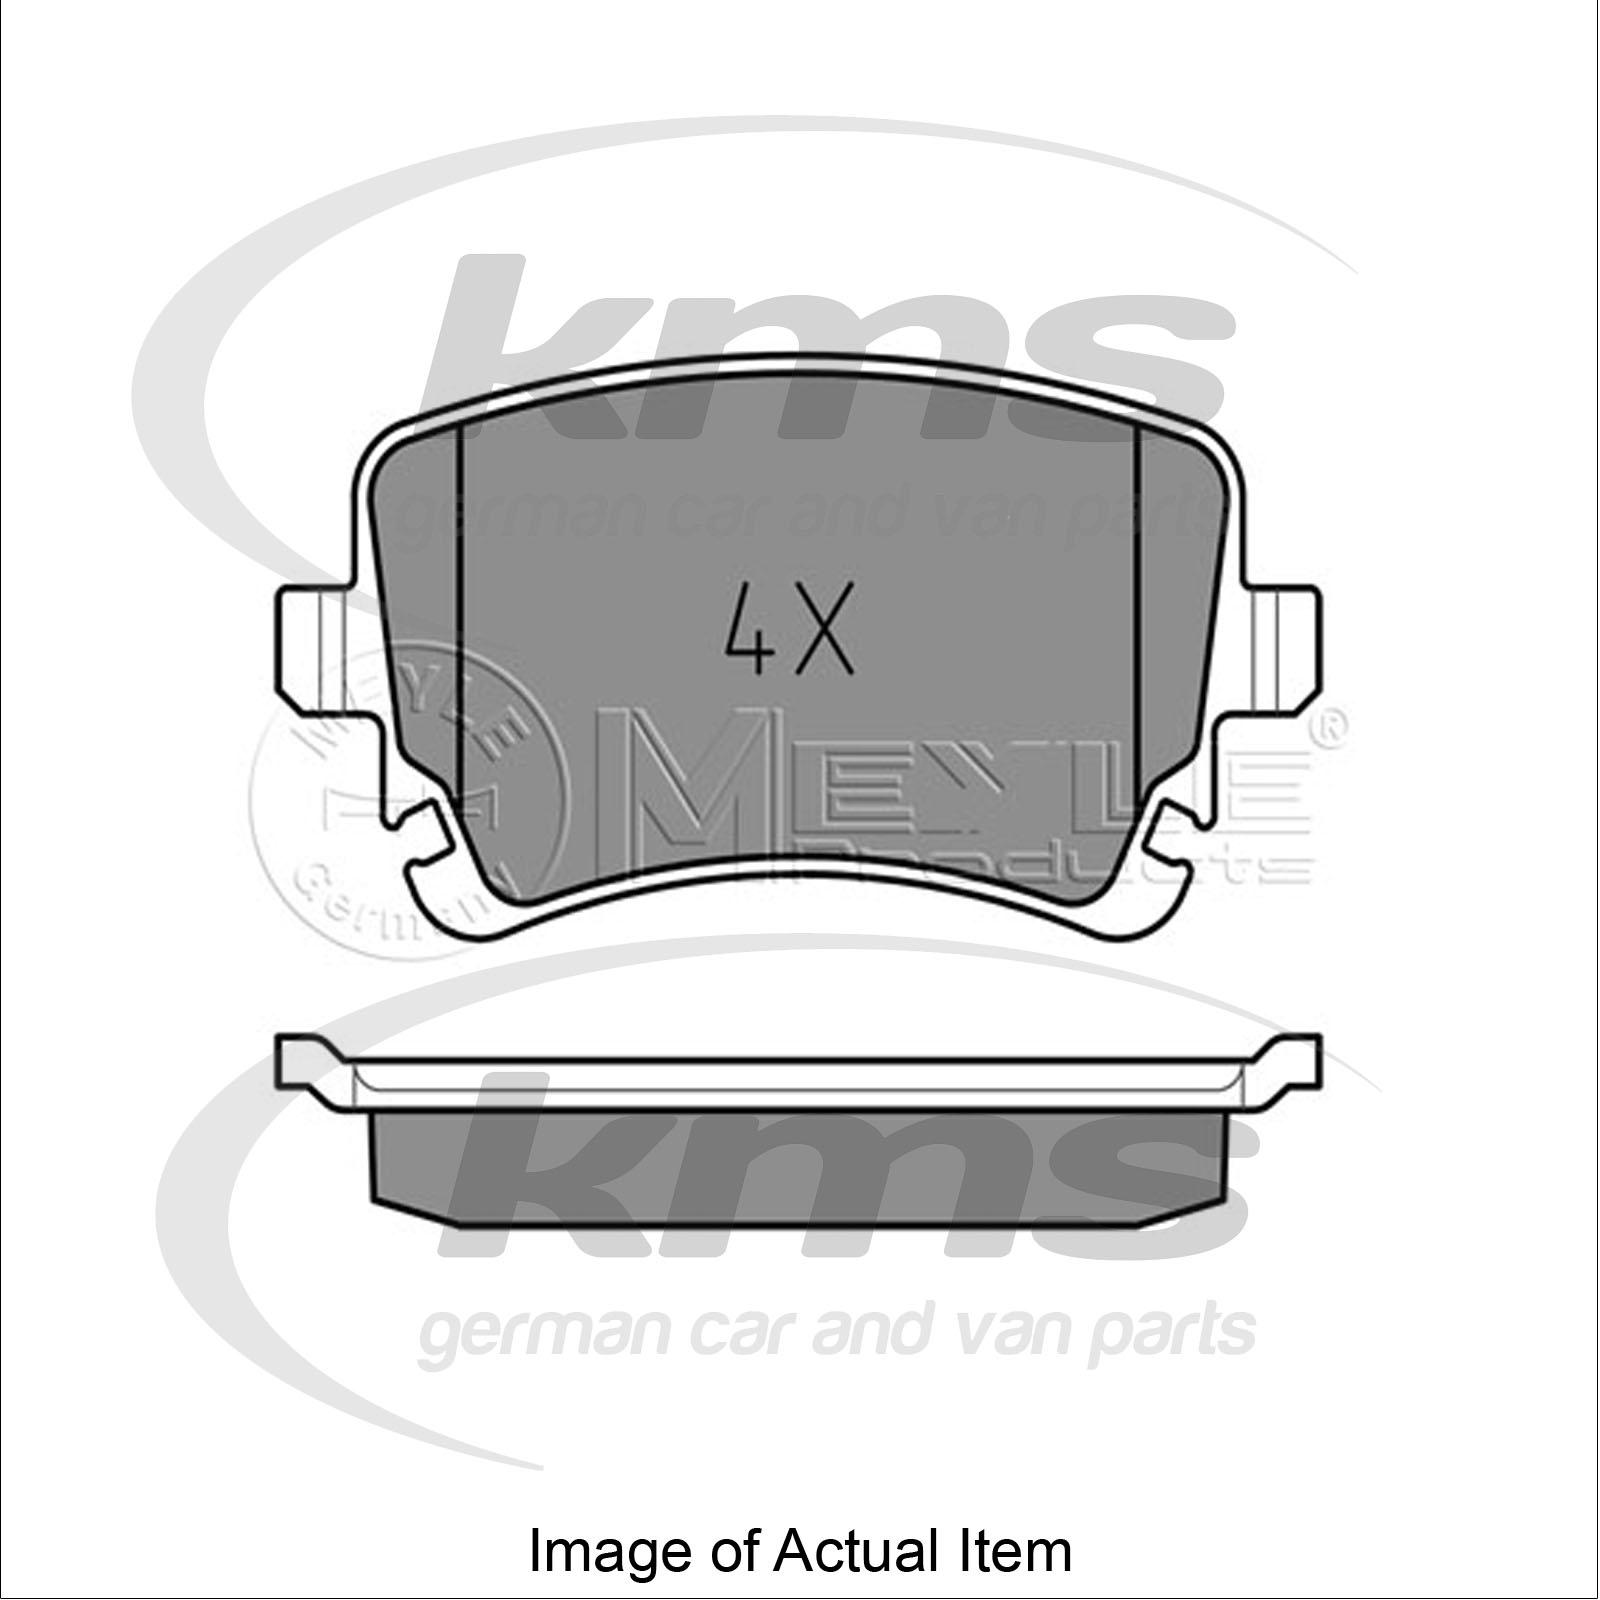 Brake Pad Set For Disc Brake Audi A6 Allroad 4fh C6 3 2 Fsi Quattro 255bhp To Ebay